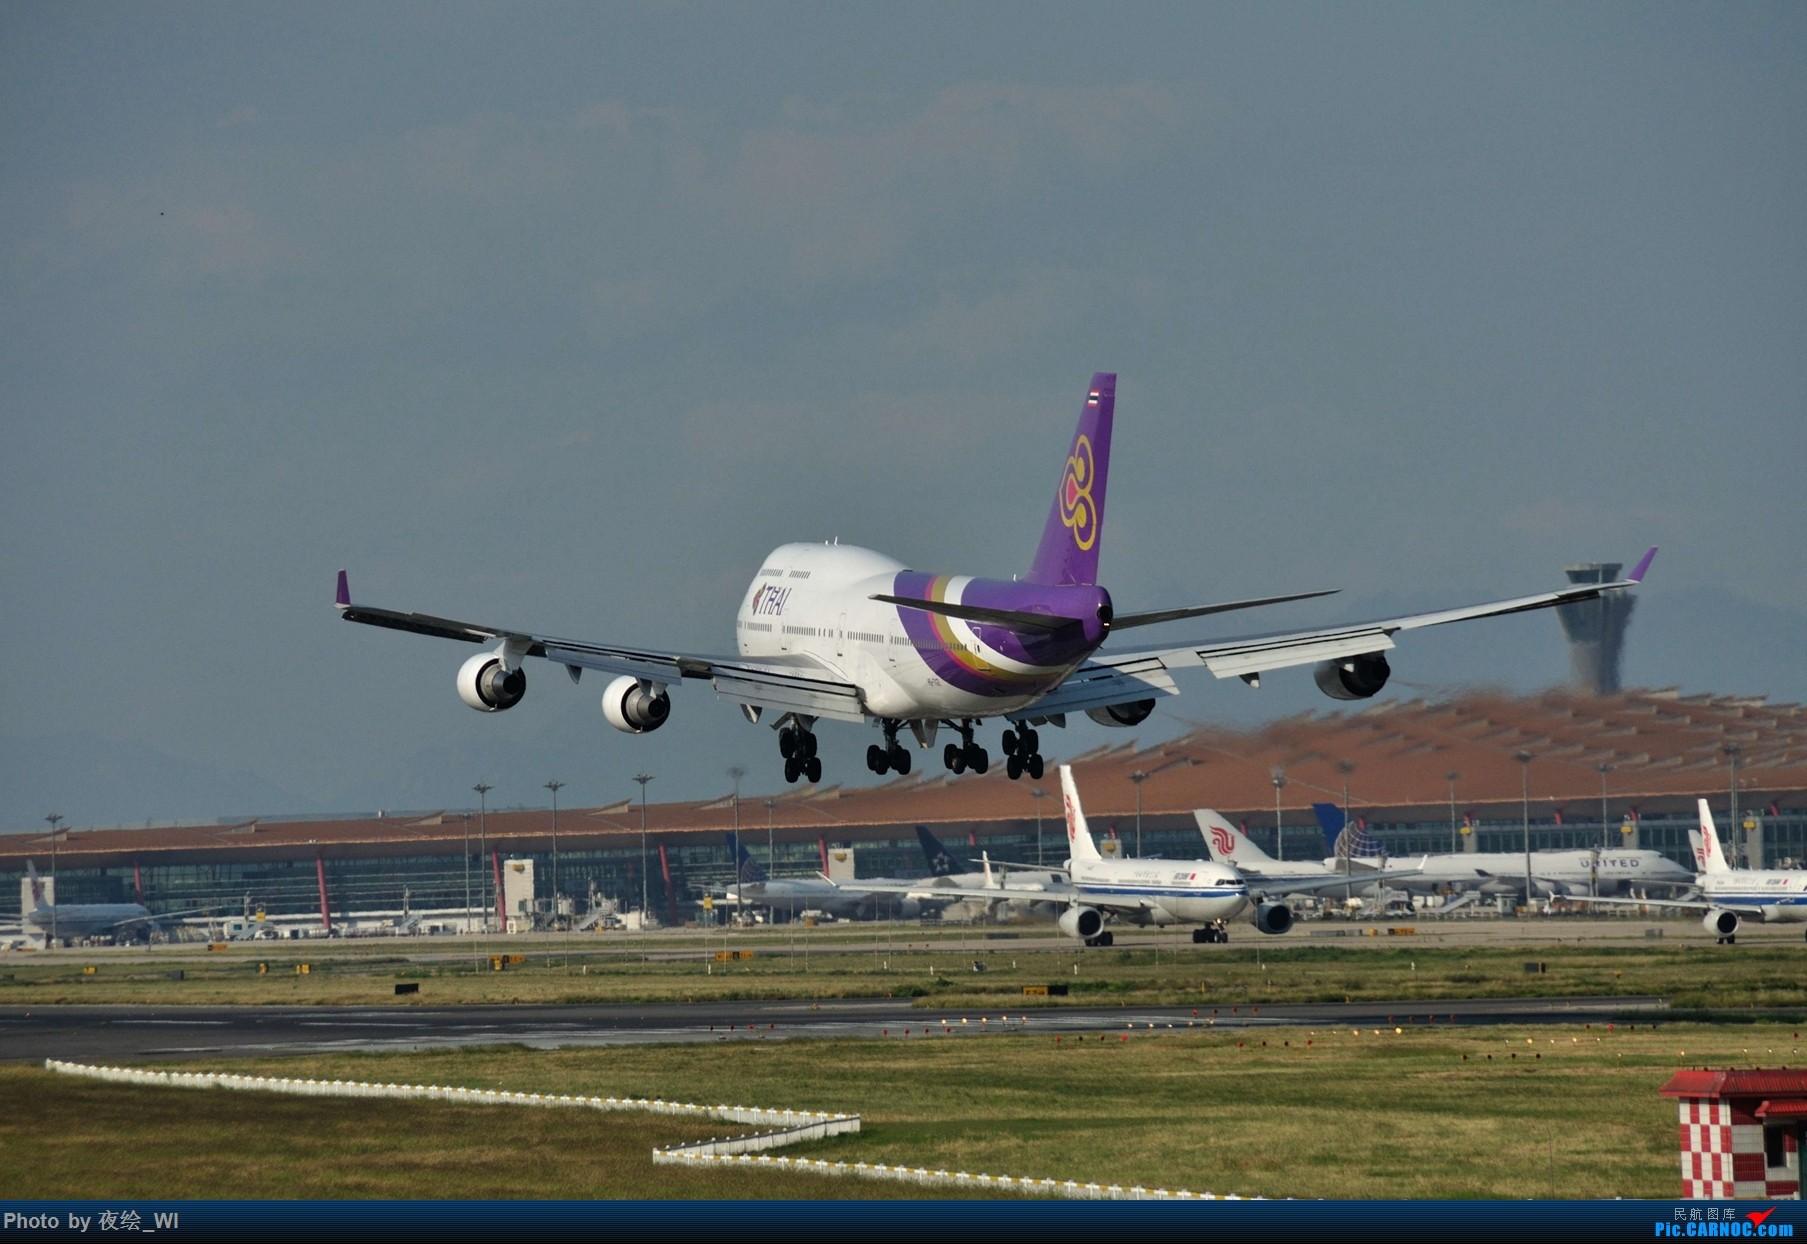 Re:[原创]【PEK】初刷八卦台,拍得飞起! BOEING 747-400 HS-TGZ 中国北京首都国际机场